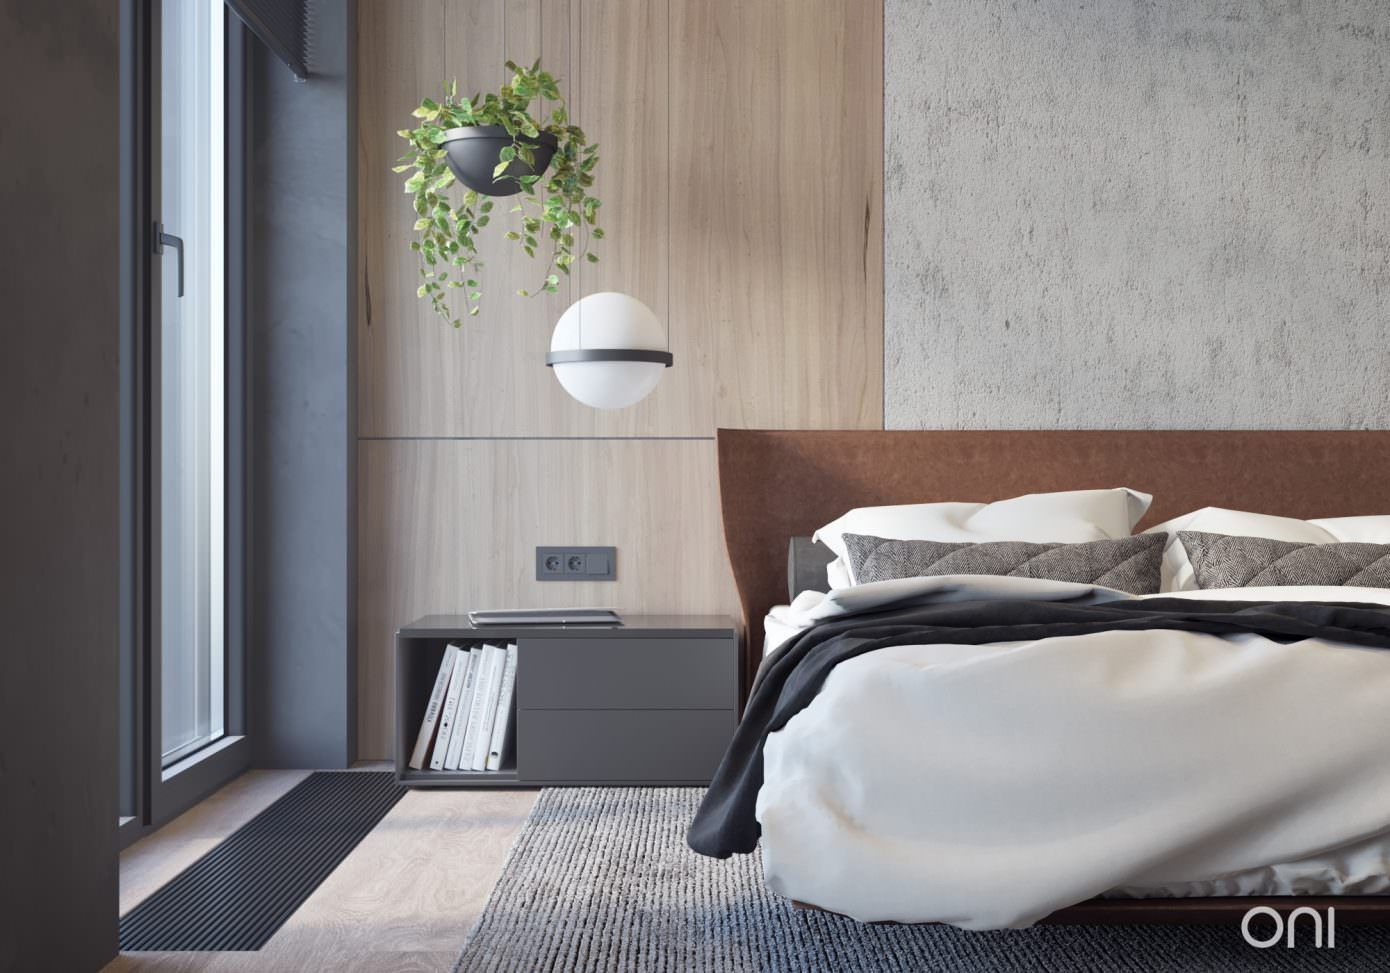 Loft space bedroom ideas  cozyloftoniarchitects  HomeAdore  decor  Pinterest  Lofts